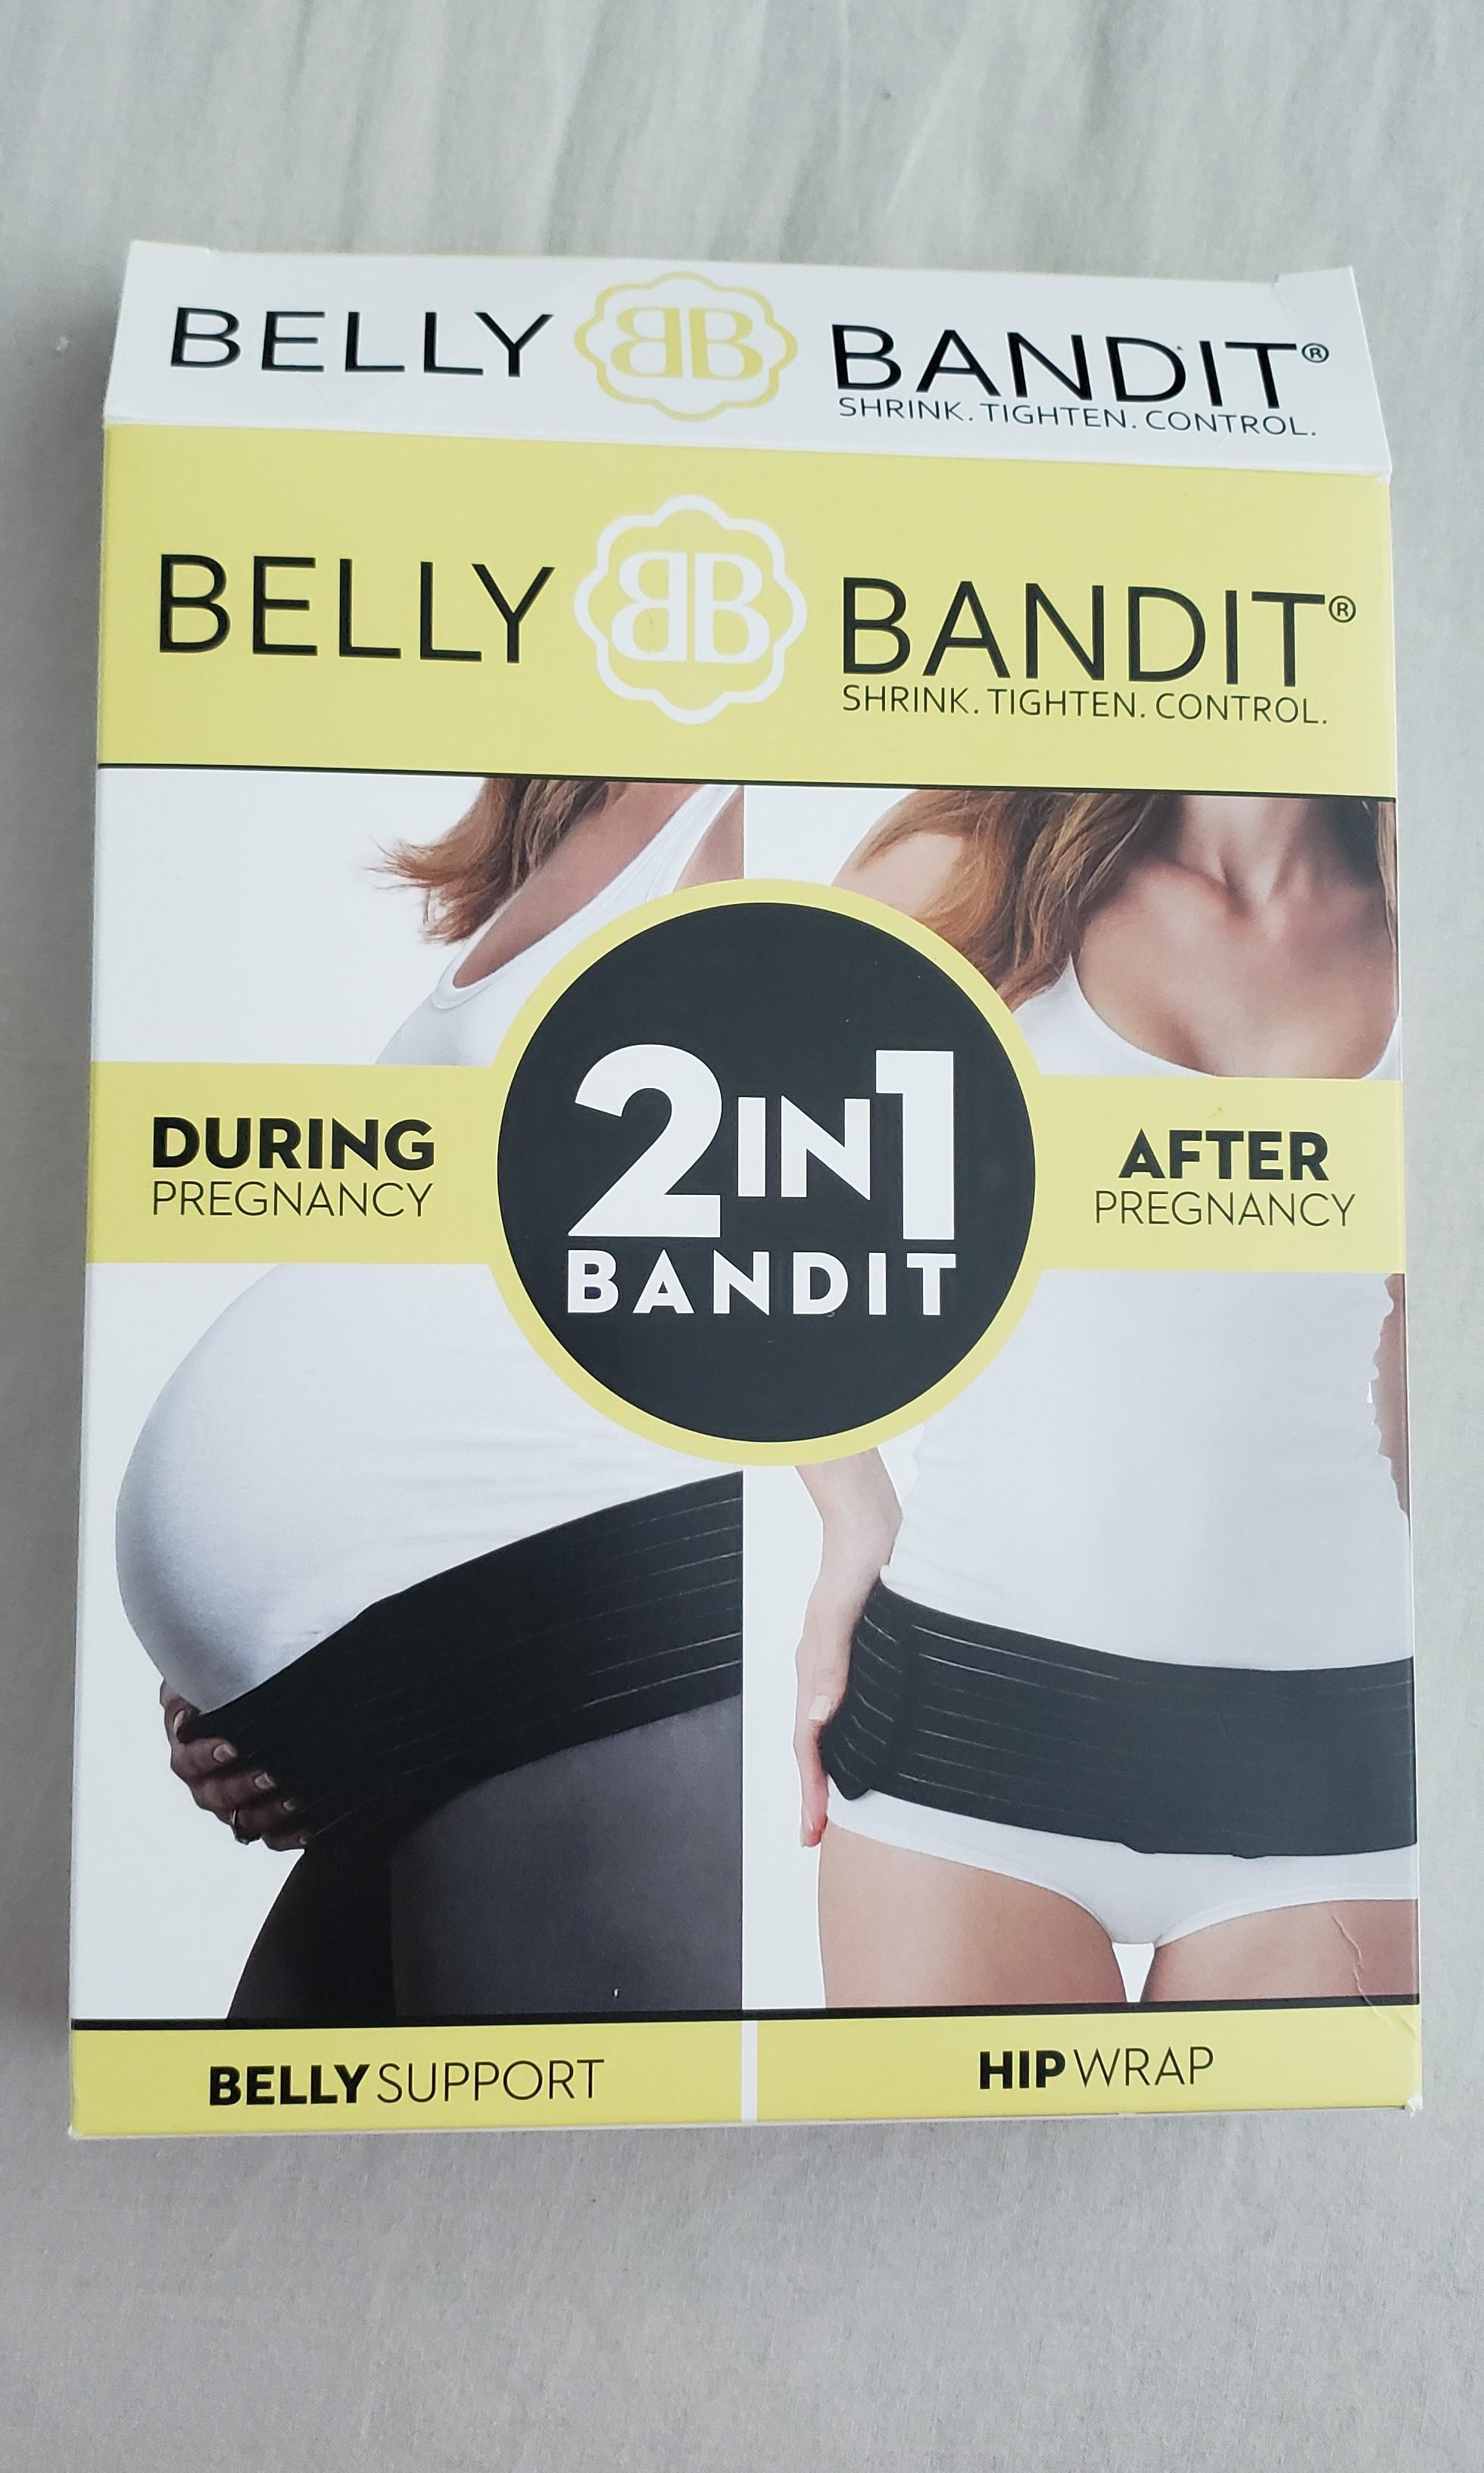 BNIB Maternity belt Belly Bandit 2-in-1 - Size 1, Black